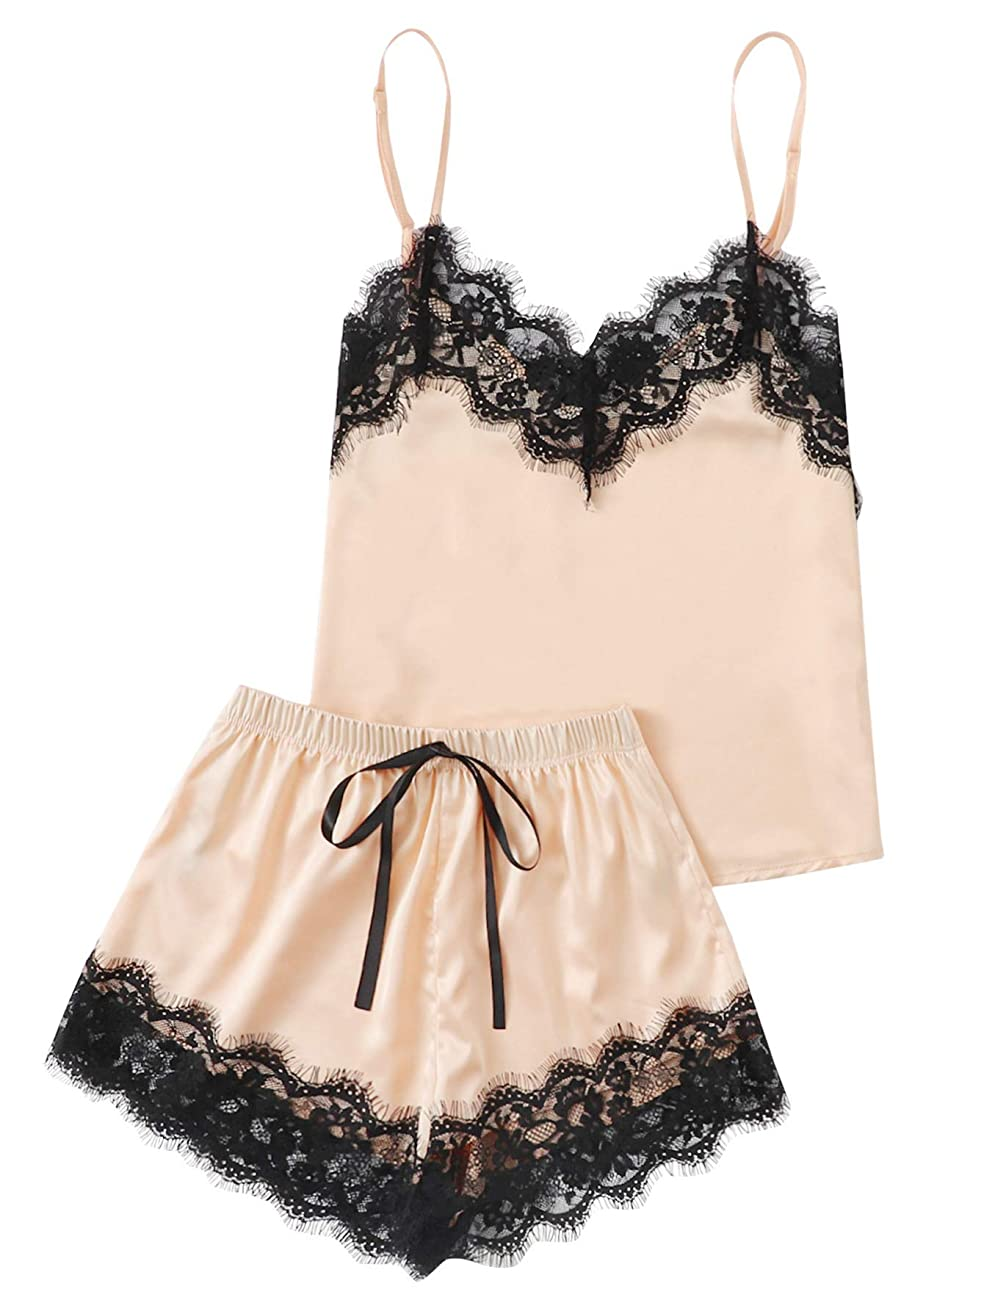 MAKEMECHIC Women's Lace Satin Sleepwear Cami Top and Shorts Pajama Set